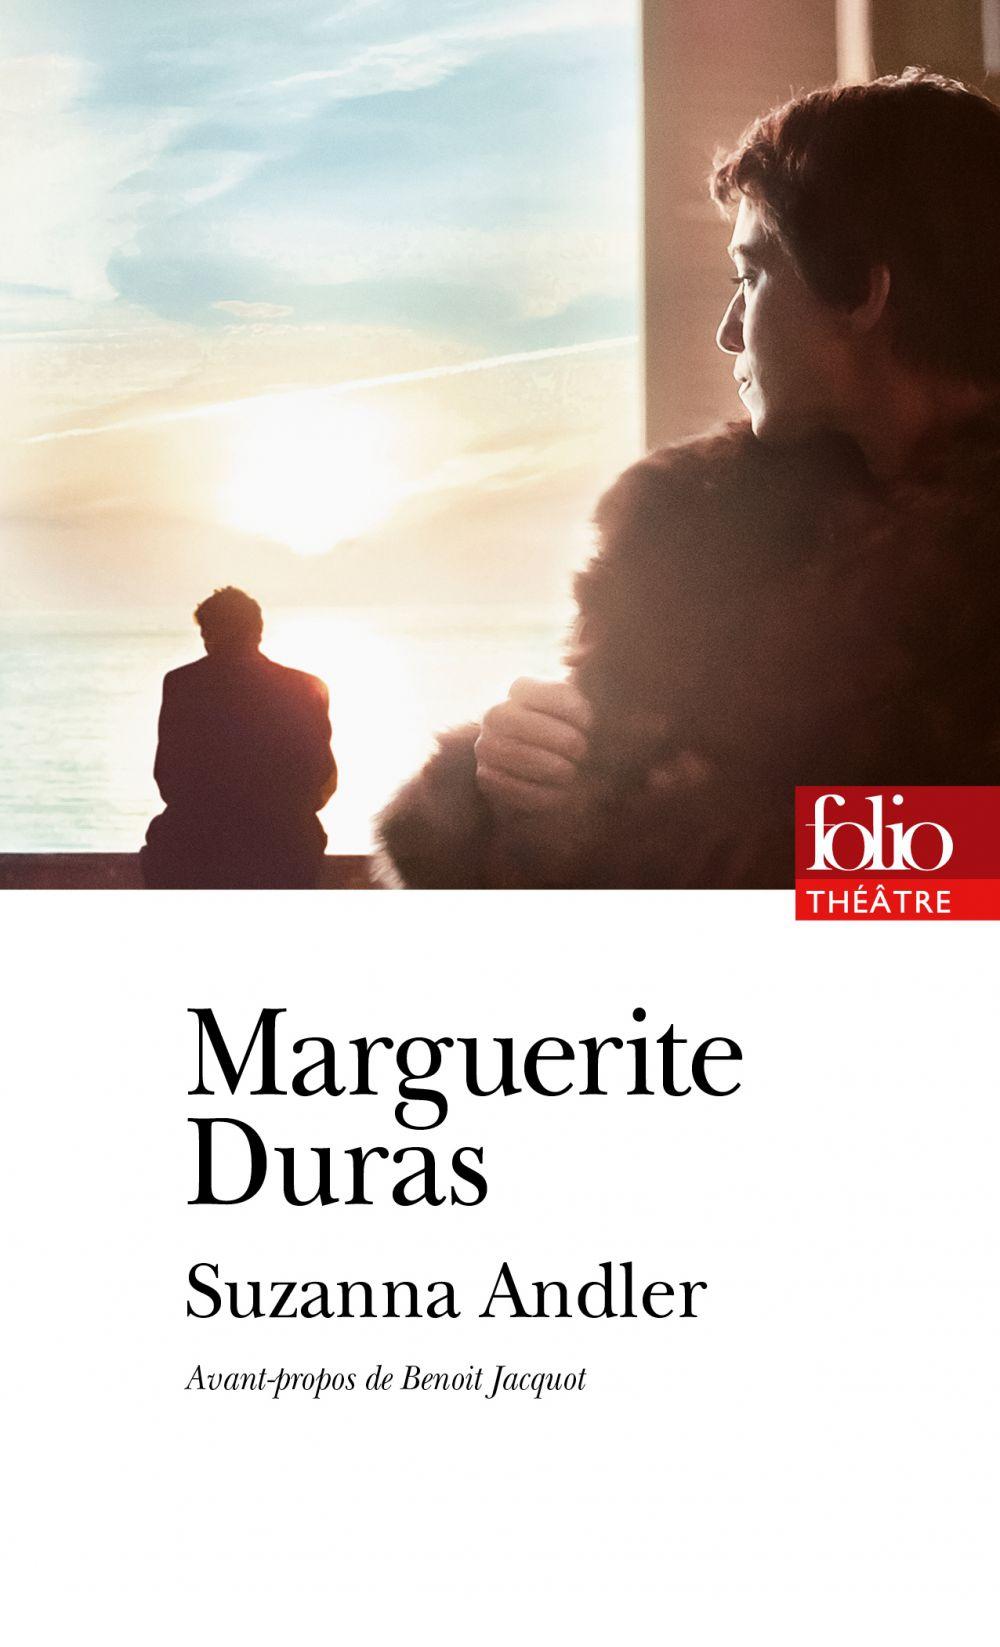 Suzanna Andler | Duras, Marguerite (1914-1996). Auteur